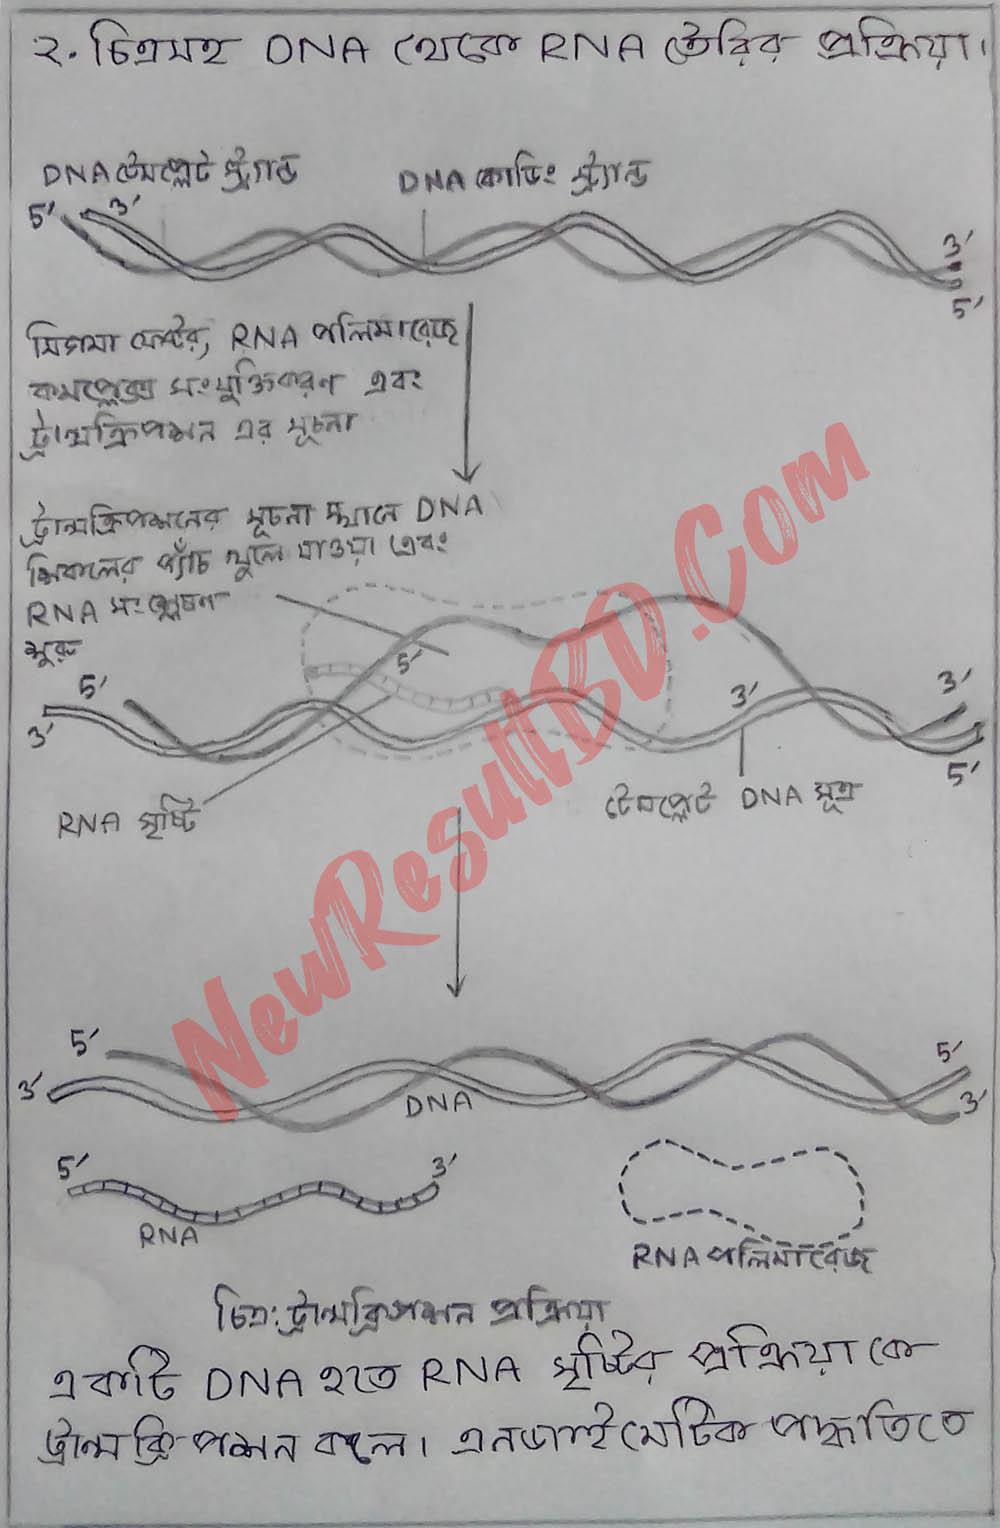 DNA এর ভৌত গঠন, DNA থেকে RNA তৈরি এবং RNA থেকে প্রোটিন তৈরির প্রক্রিয়া (চিত্রসহ)